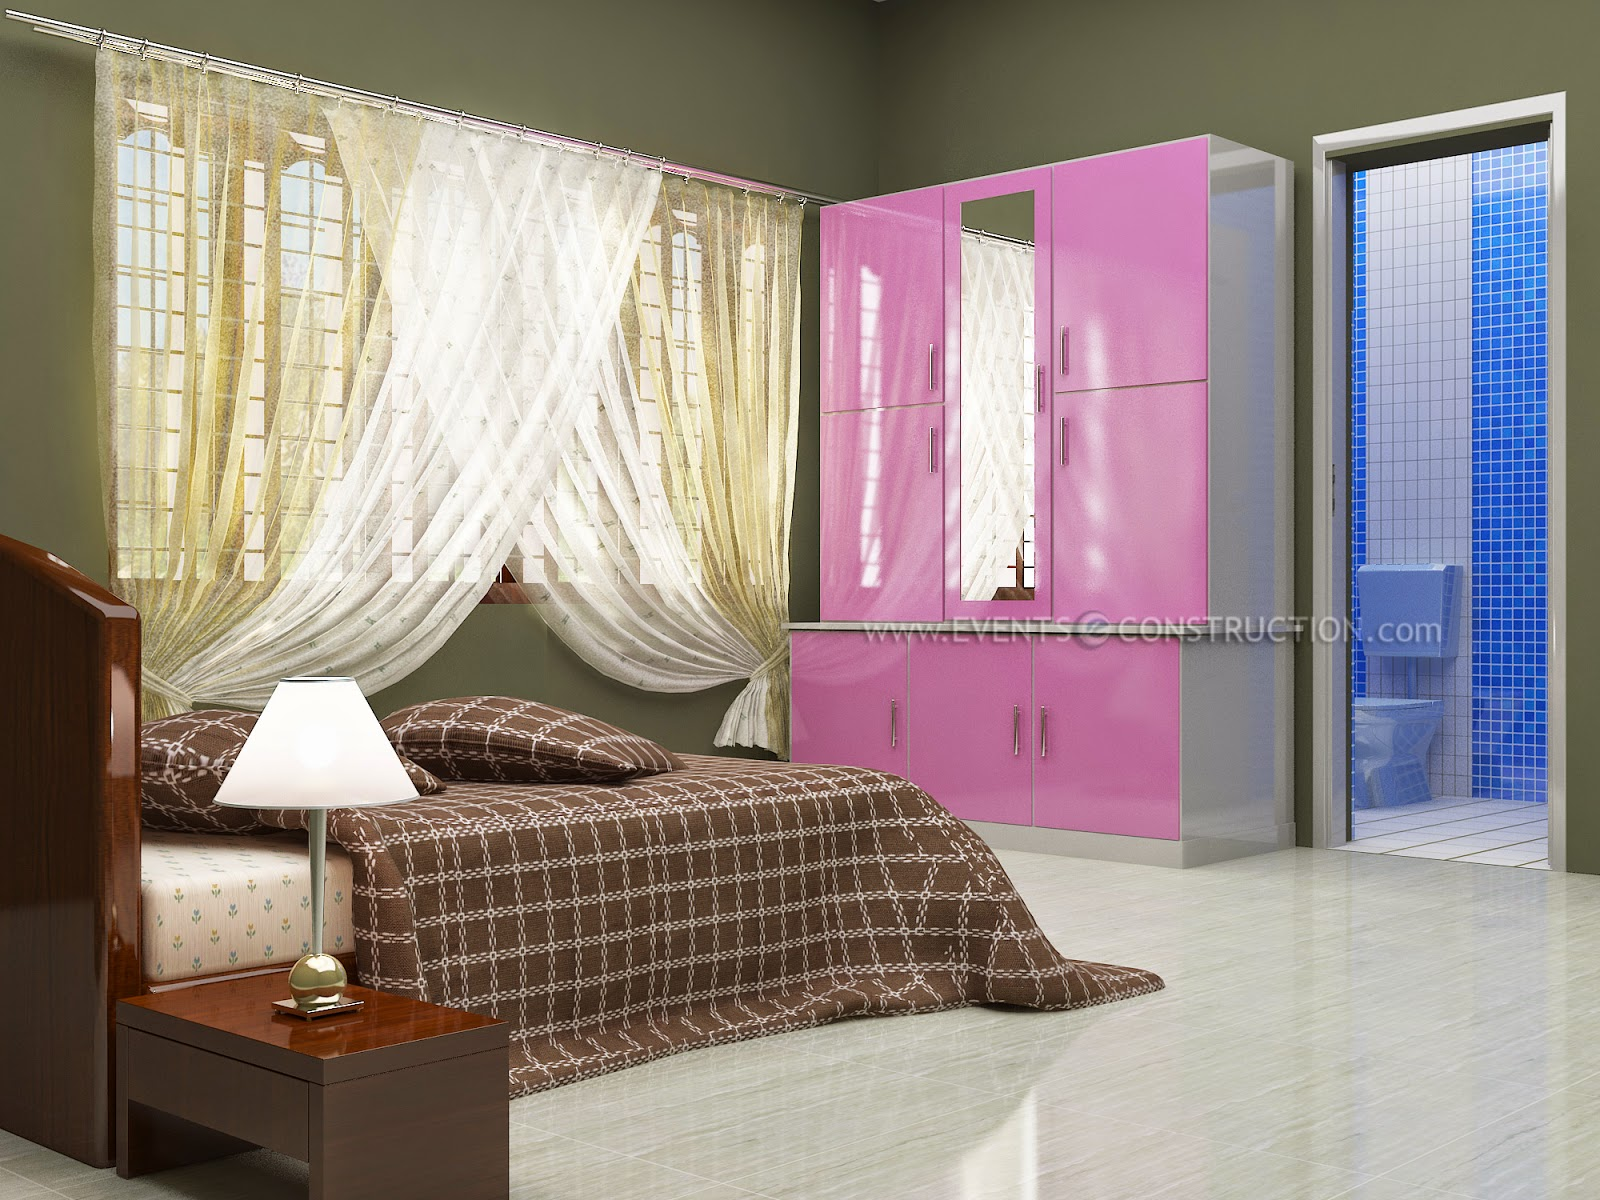 Evens construction pvt ltd kerala simple bedroom interior for Simple bedroom